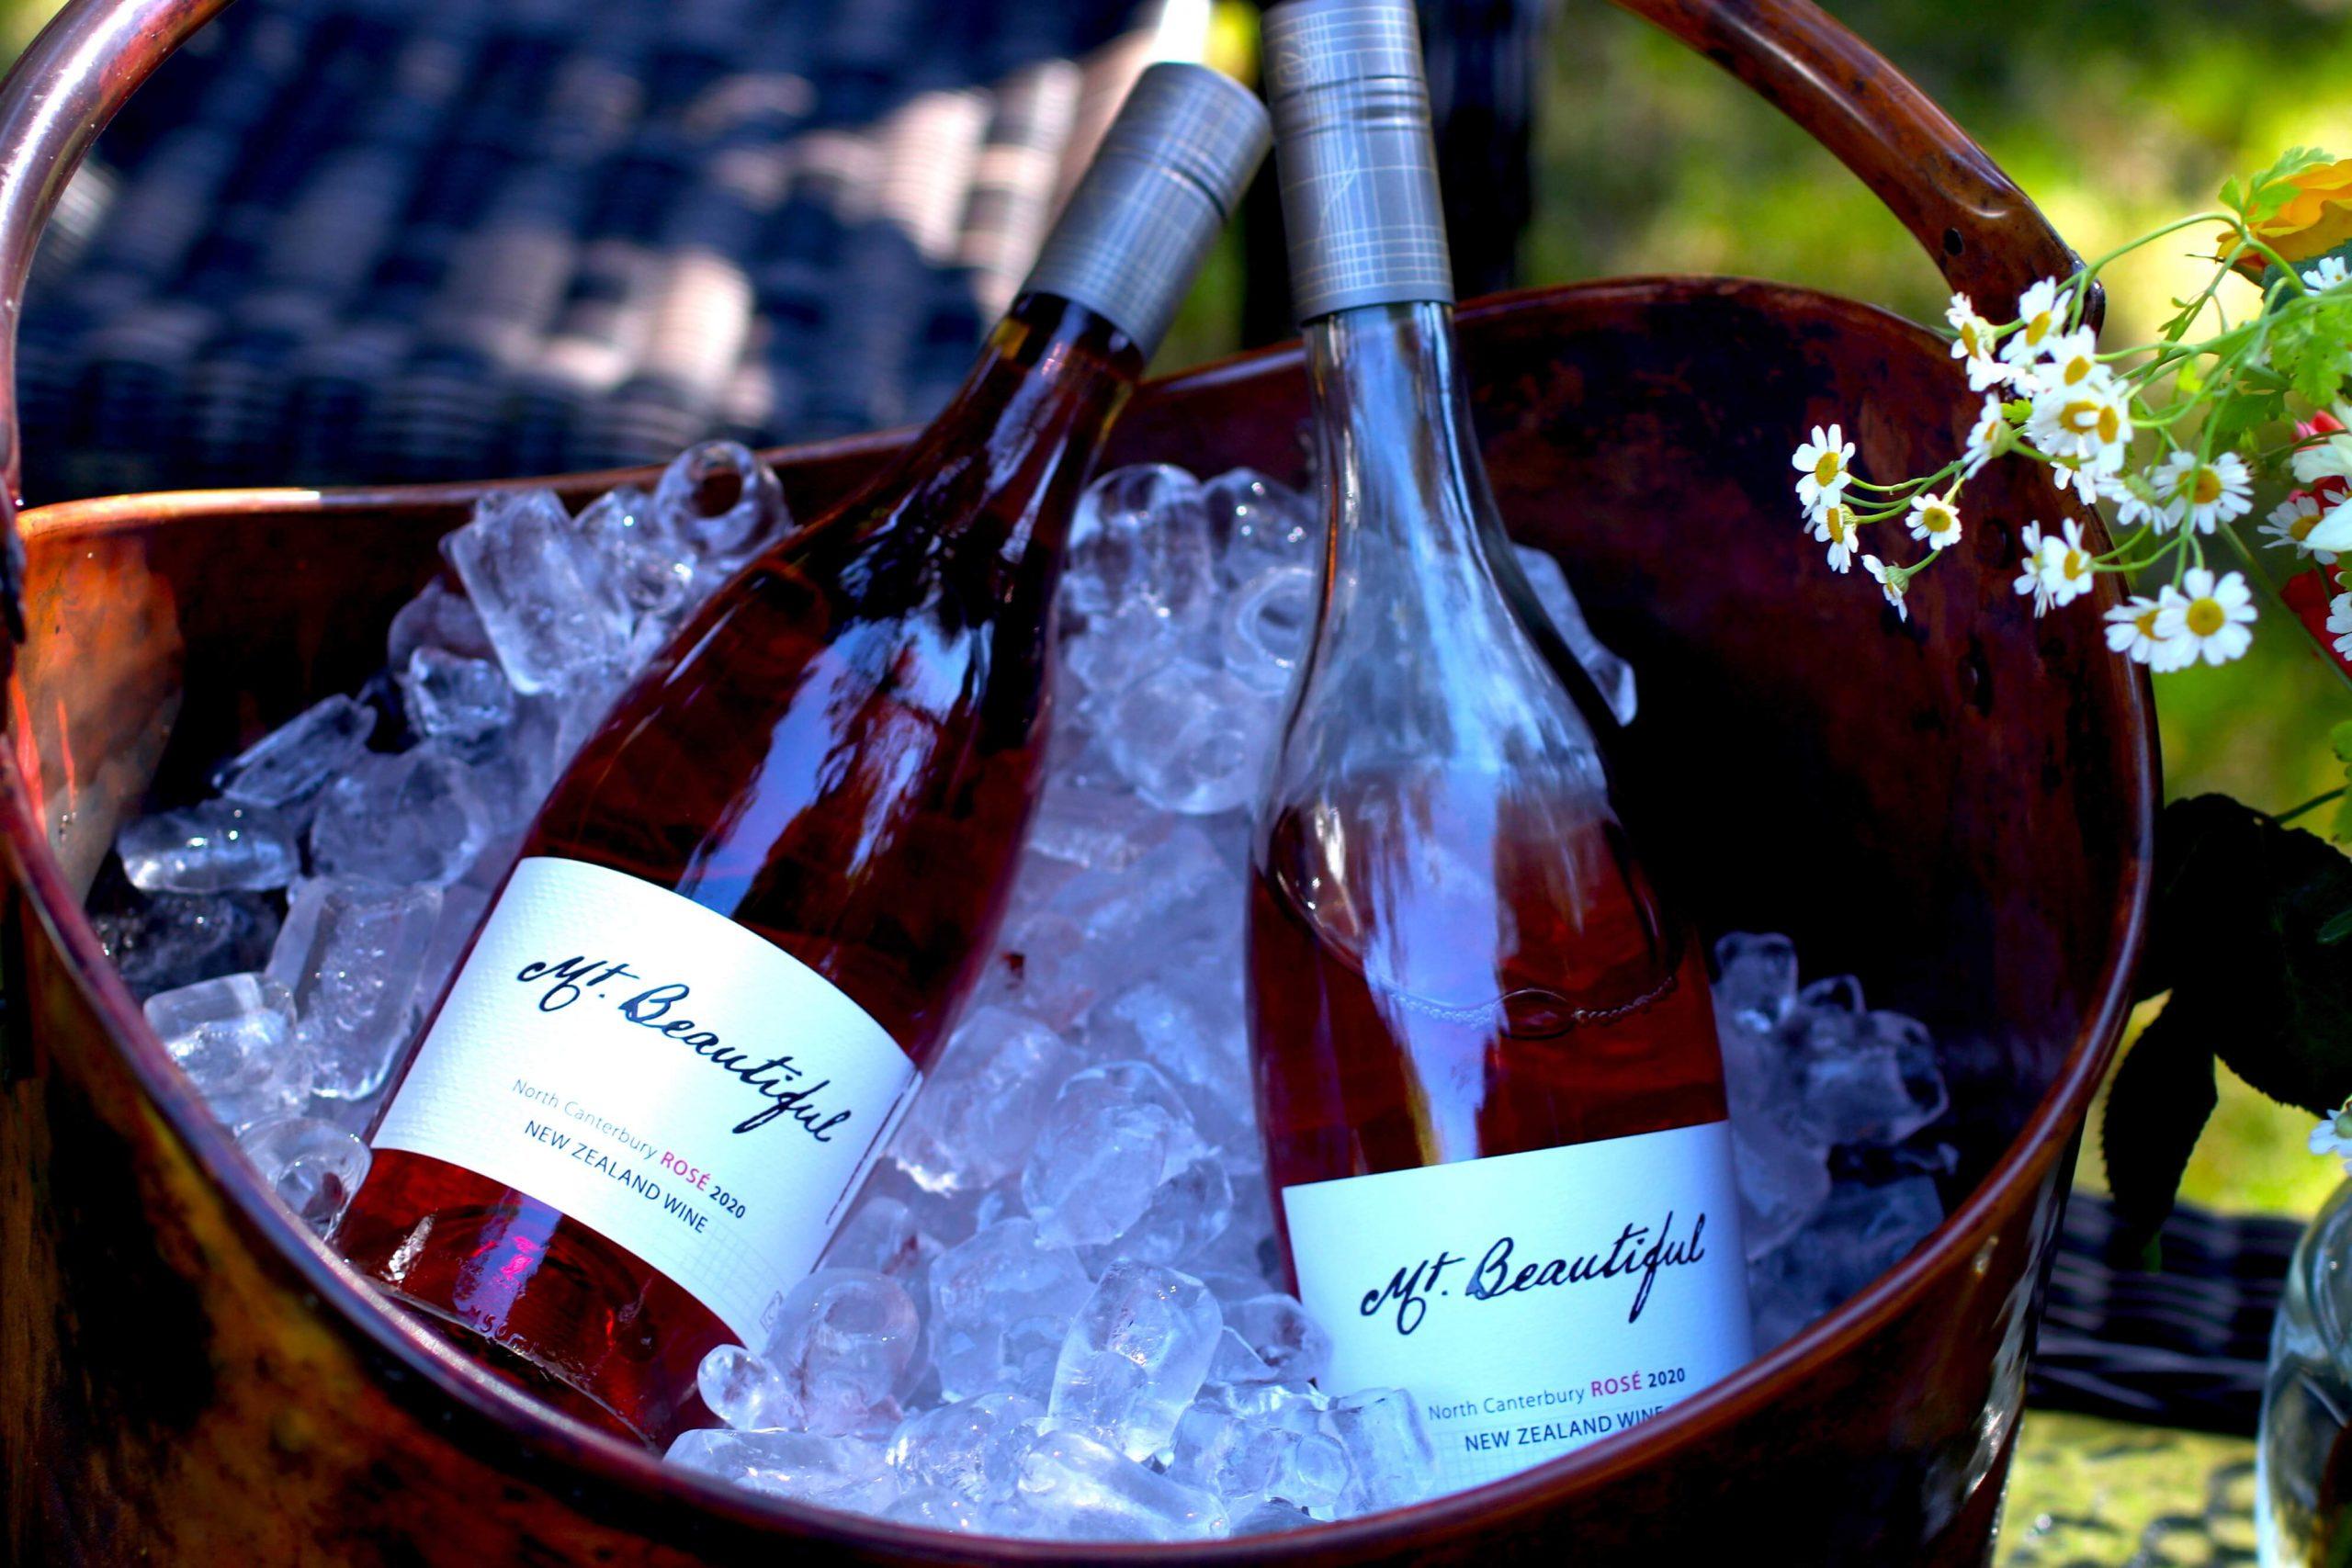 Mt. Beautiful wine, two bottles on ice